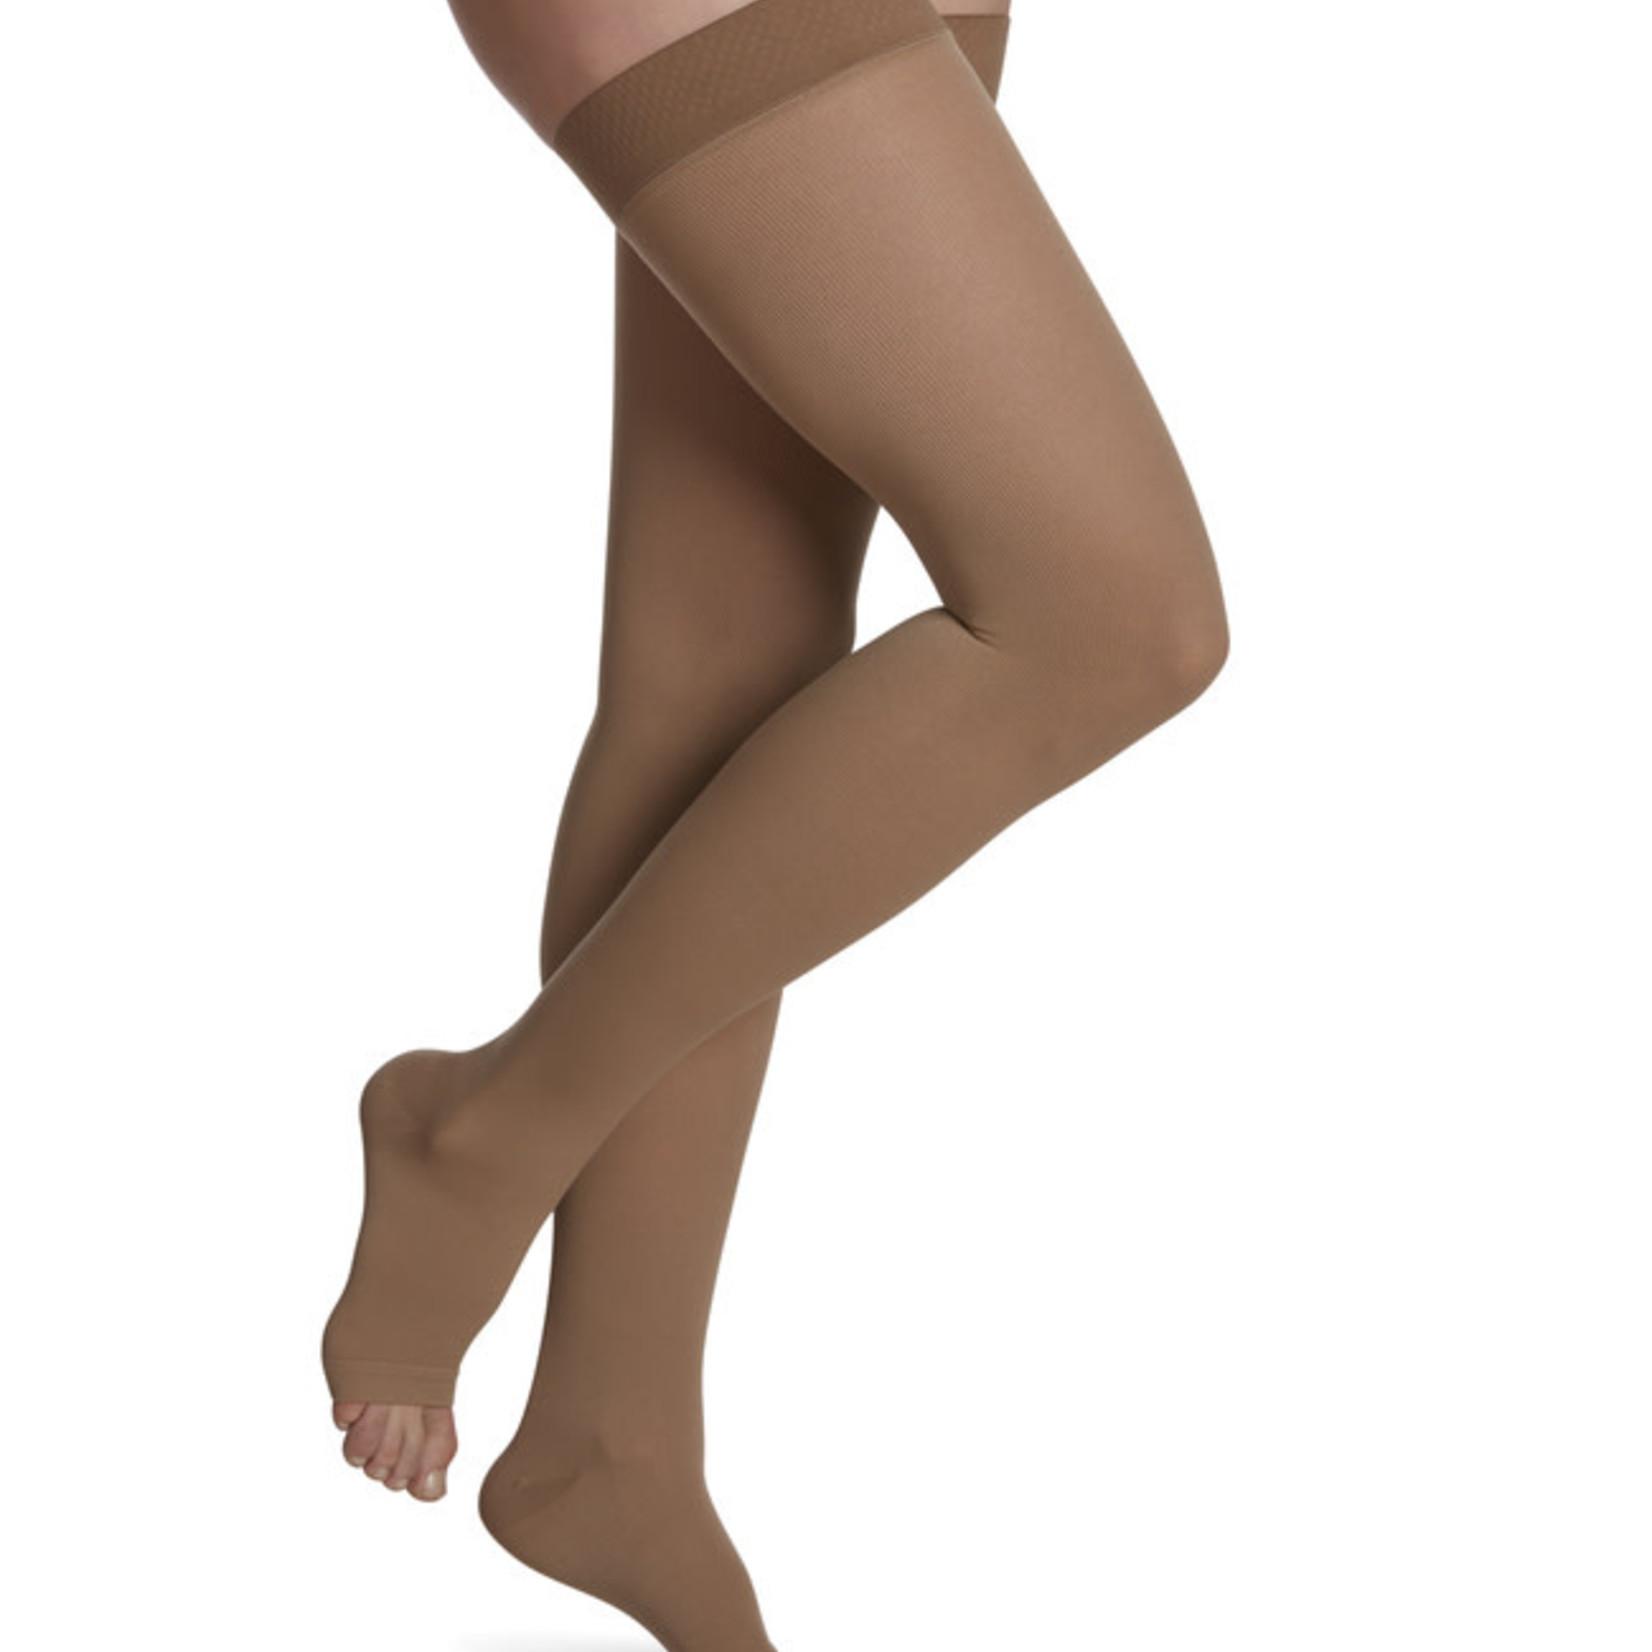 SIGVARIS Women's Essential Cotton Thigh-High 20-30mmHg